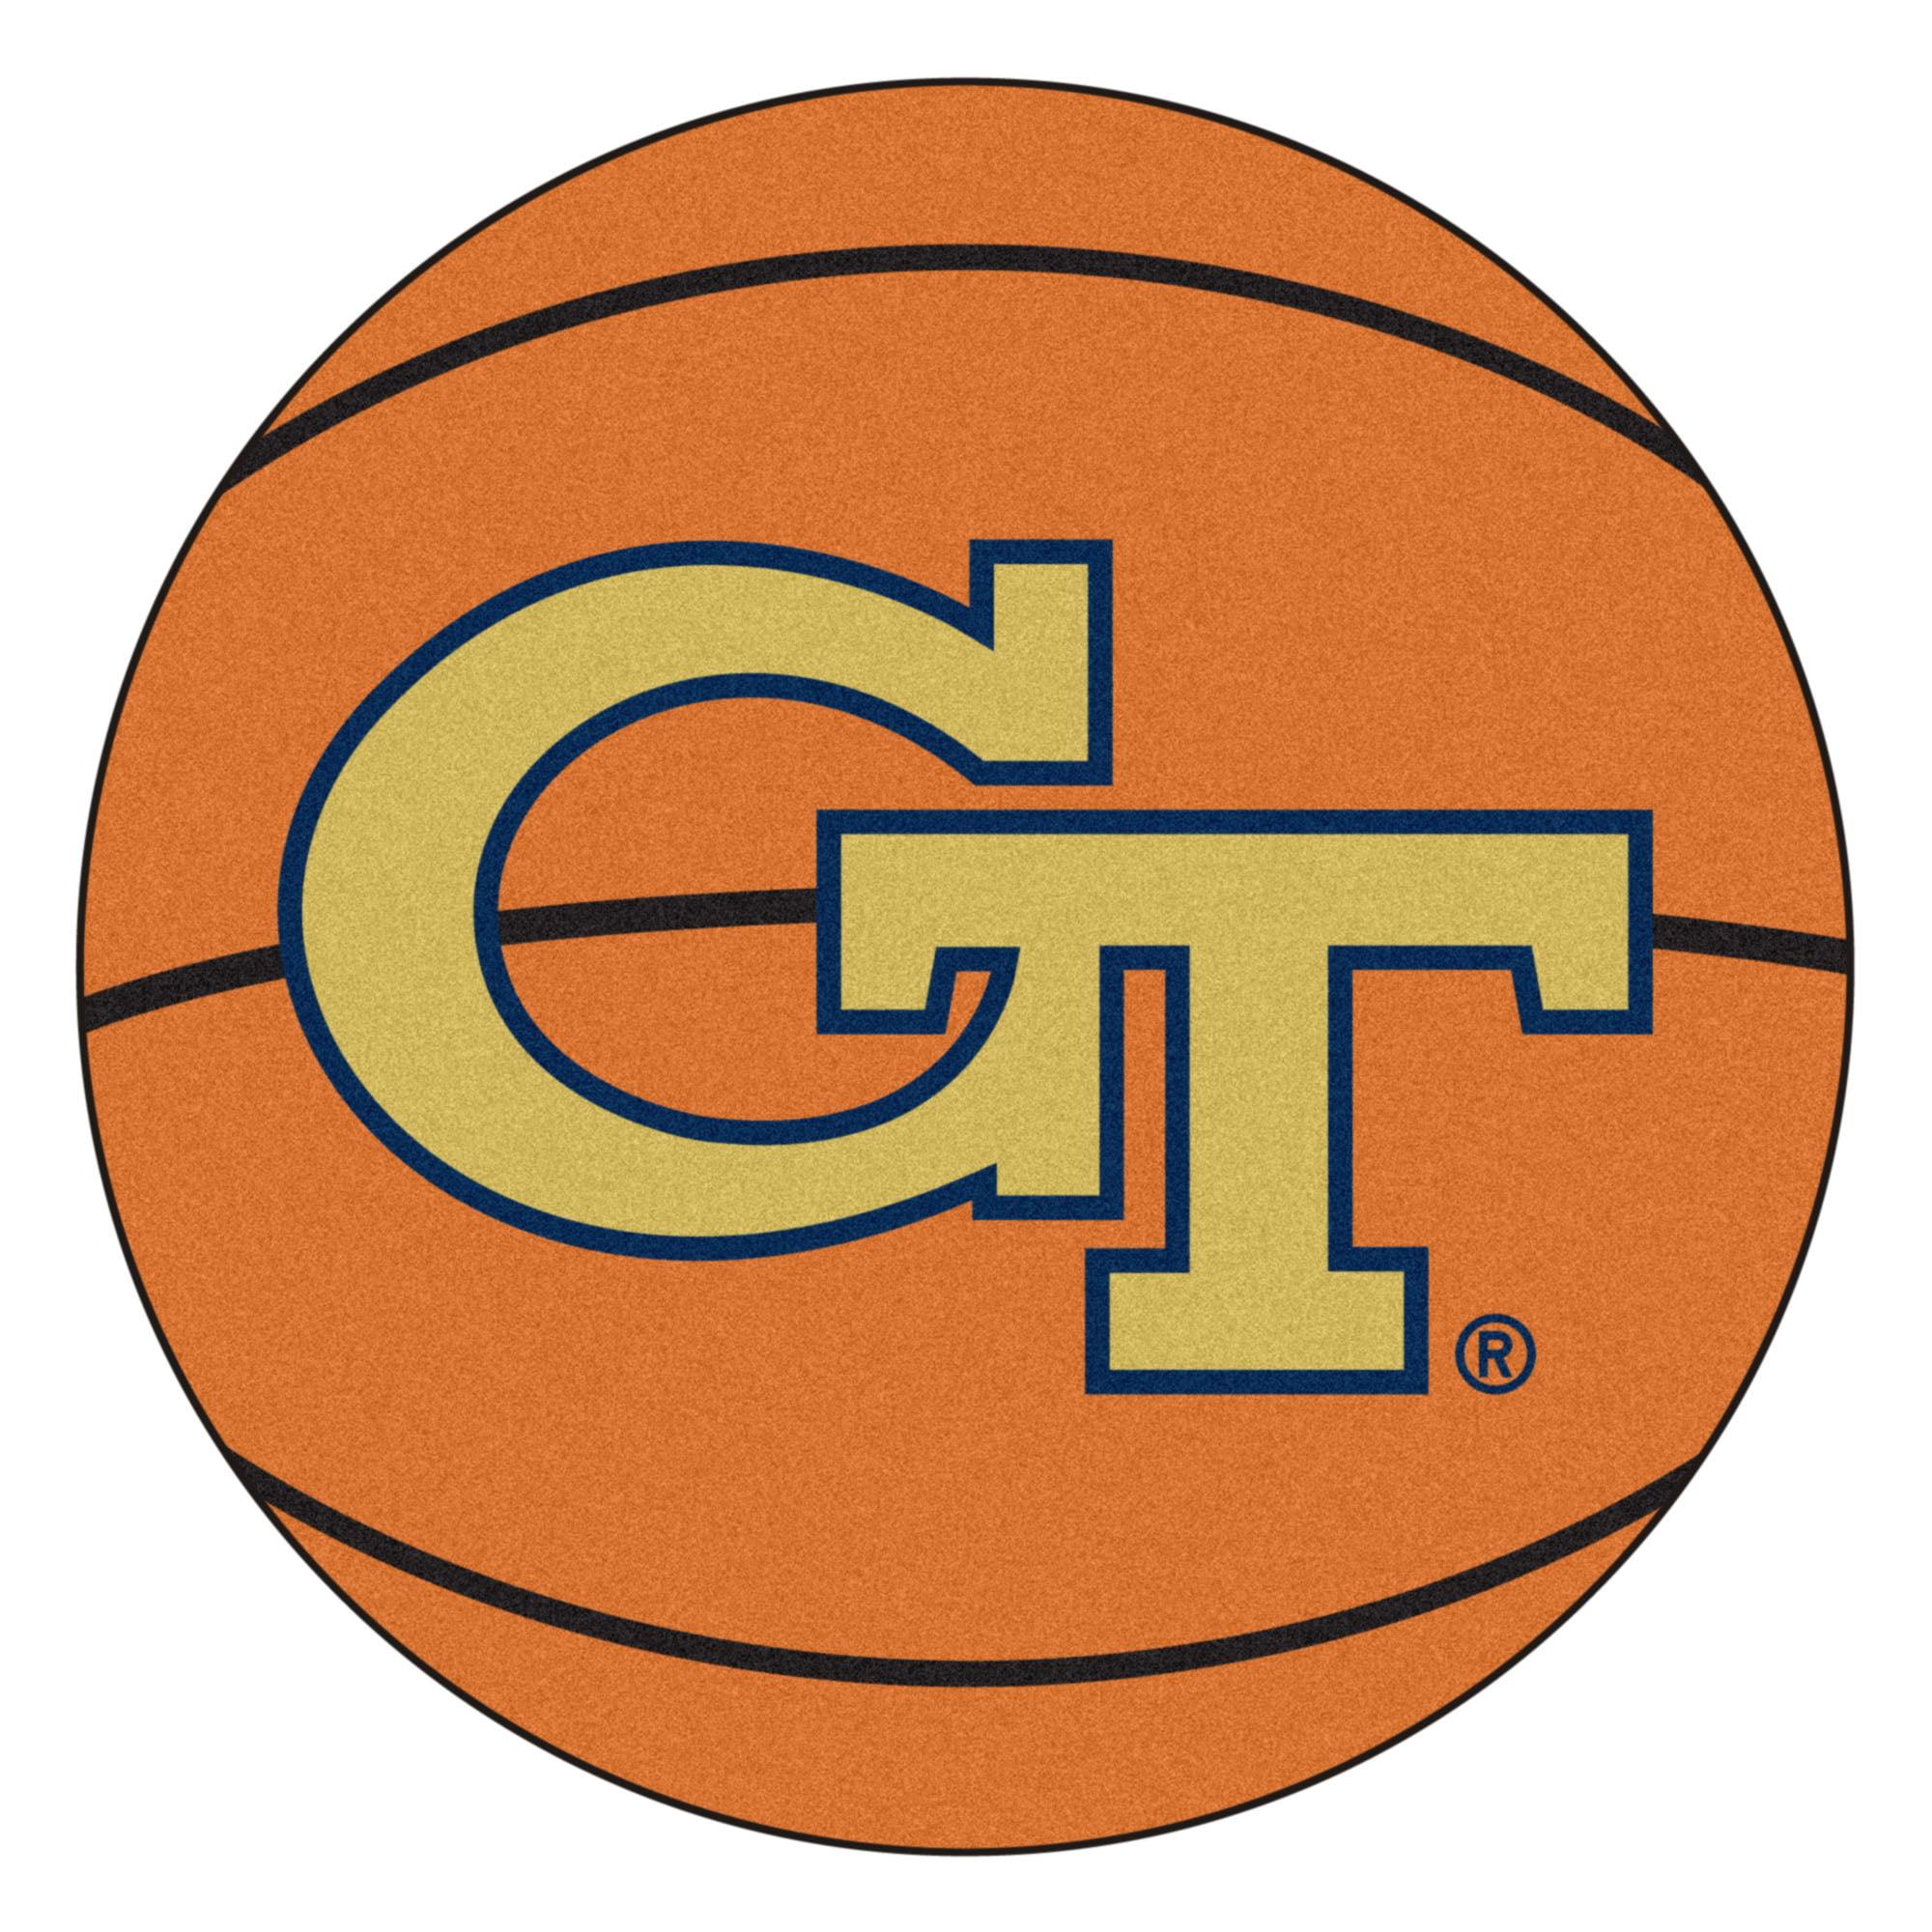 NCAA Georgia Tech Yellow Jackets, Ramblin' Wreck Basketball Shaped Mat Area Rug